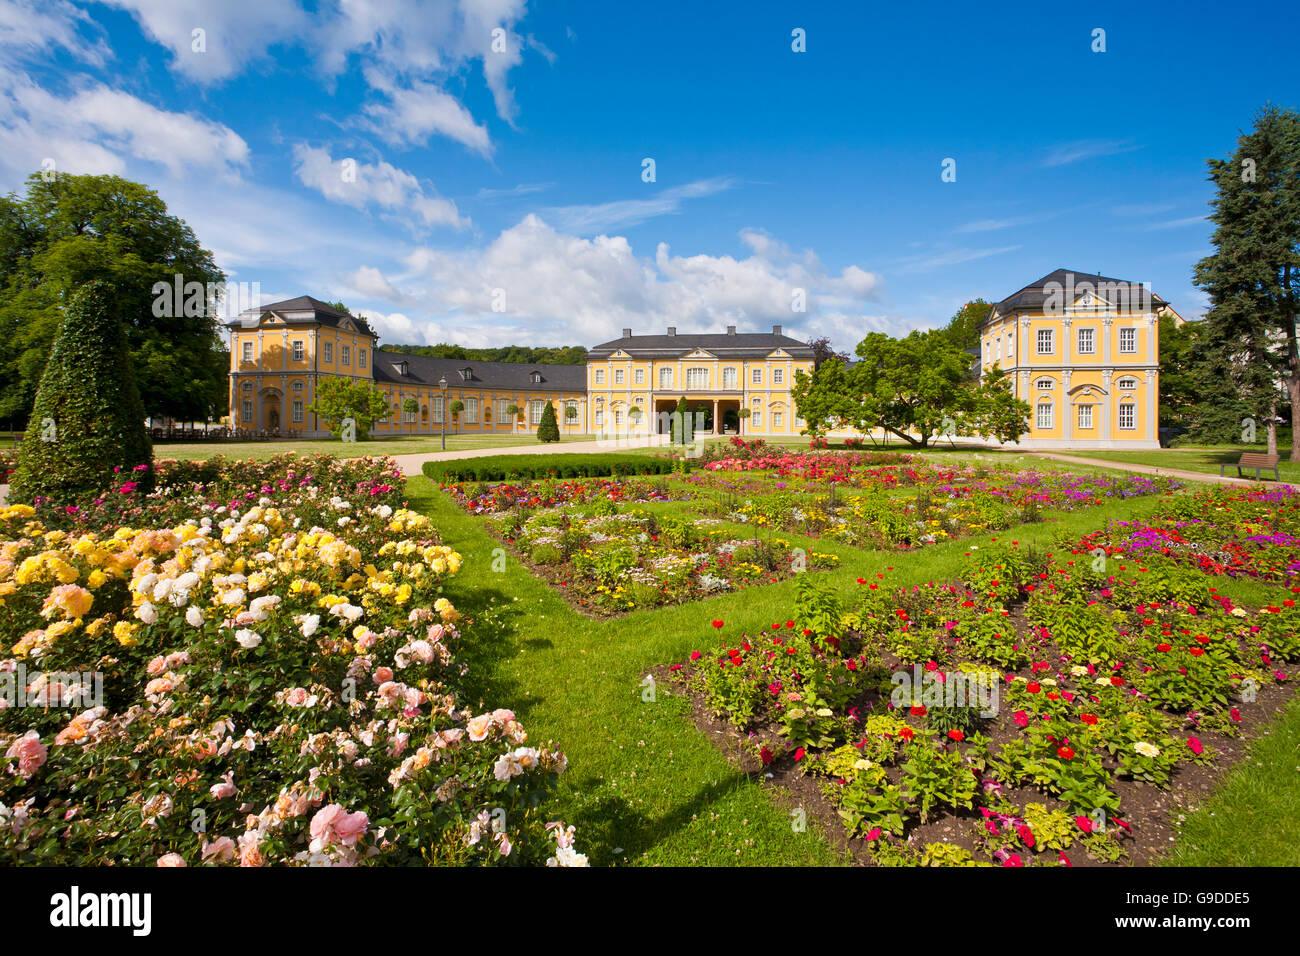 Kuechengarten, Kitchen Garden Park and the Orangery in Gera, Thuringia - Stock Image